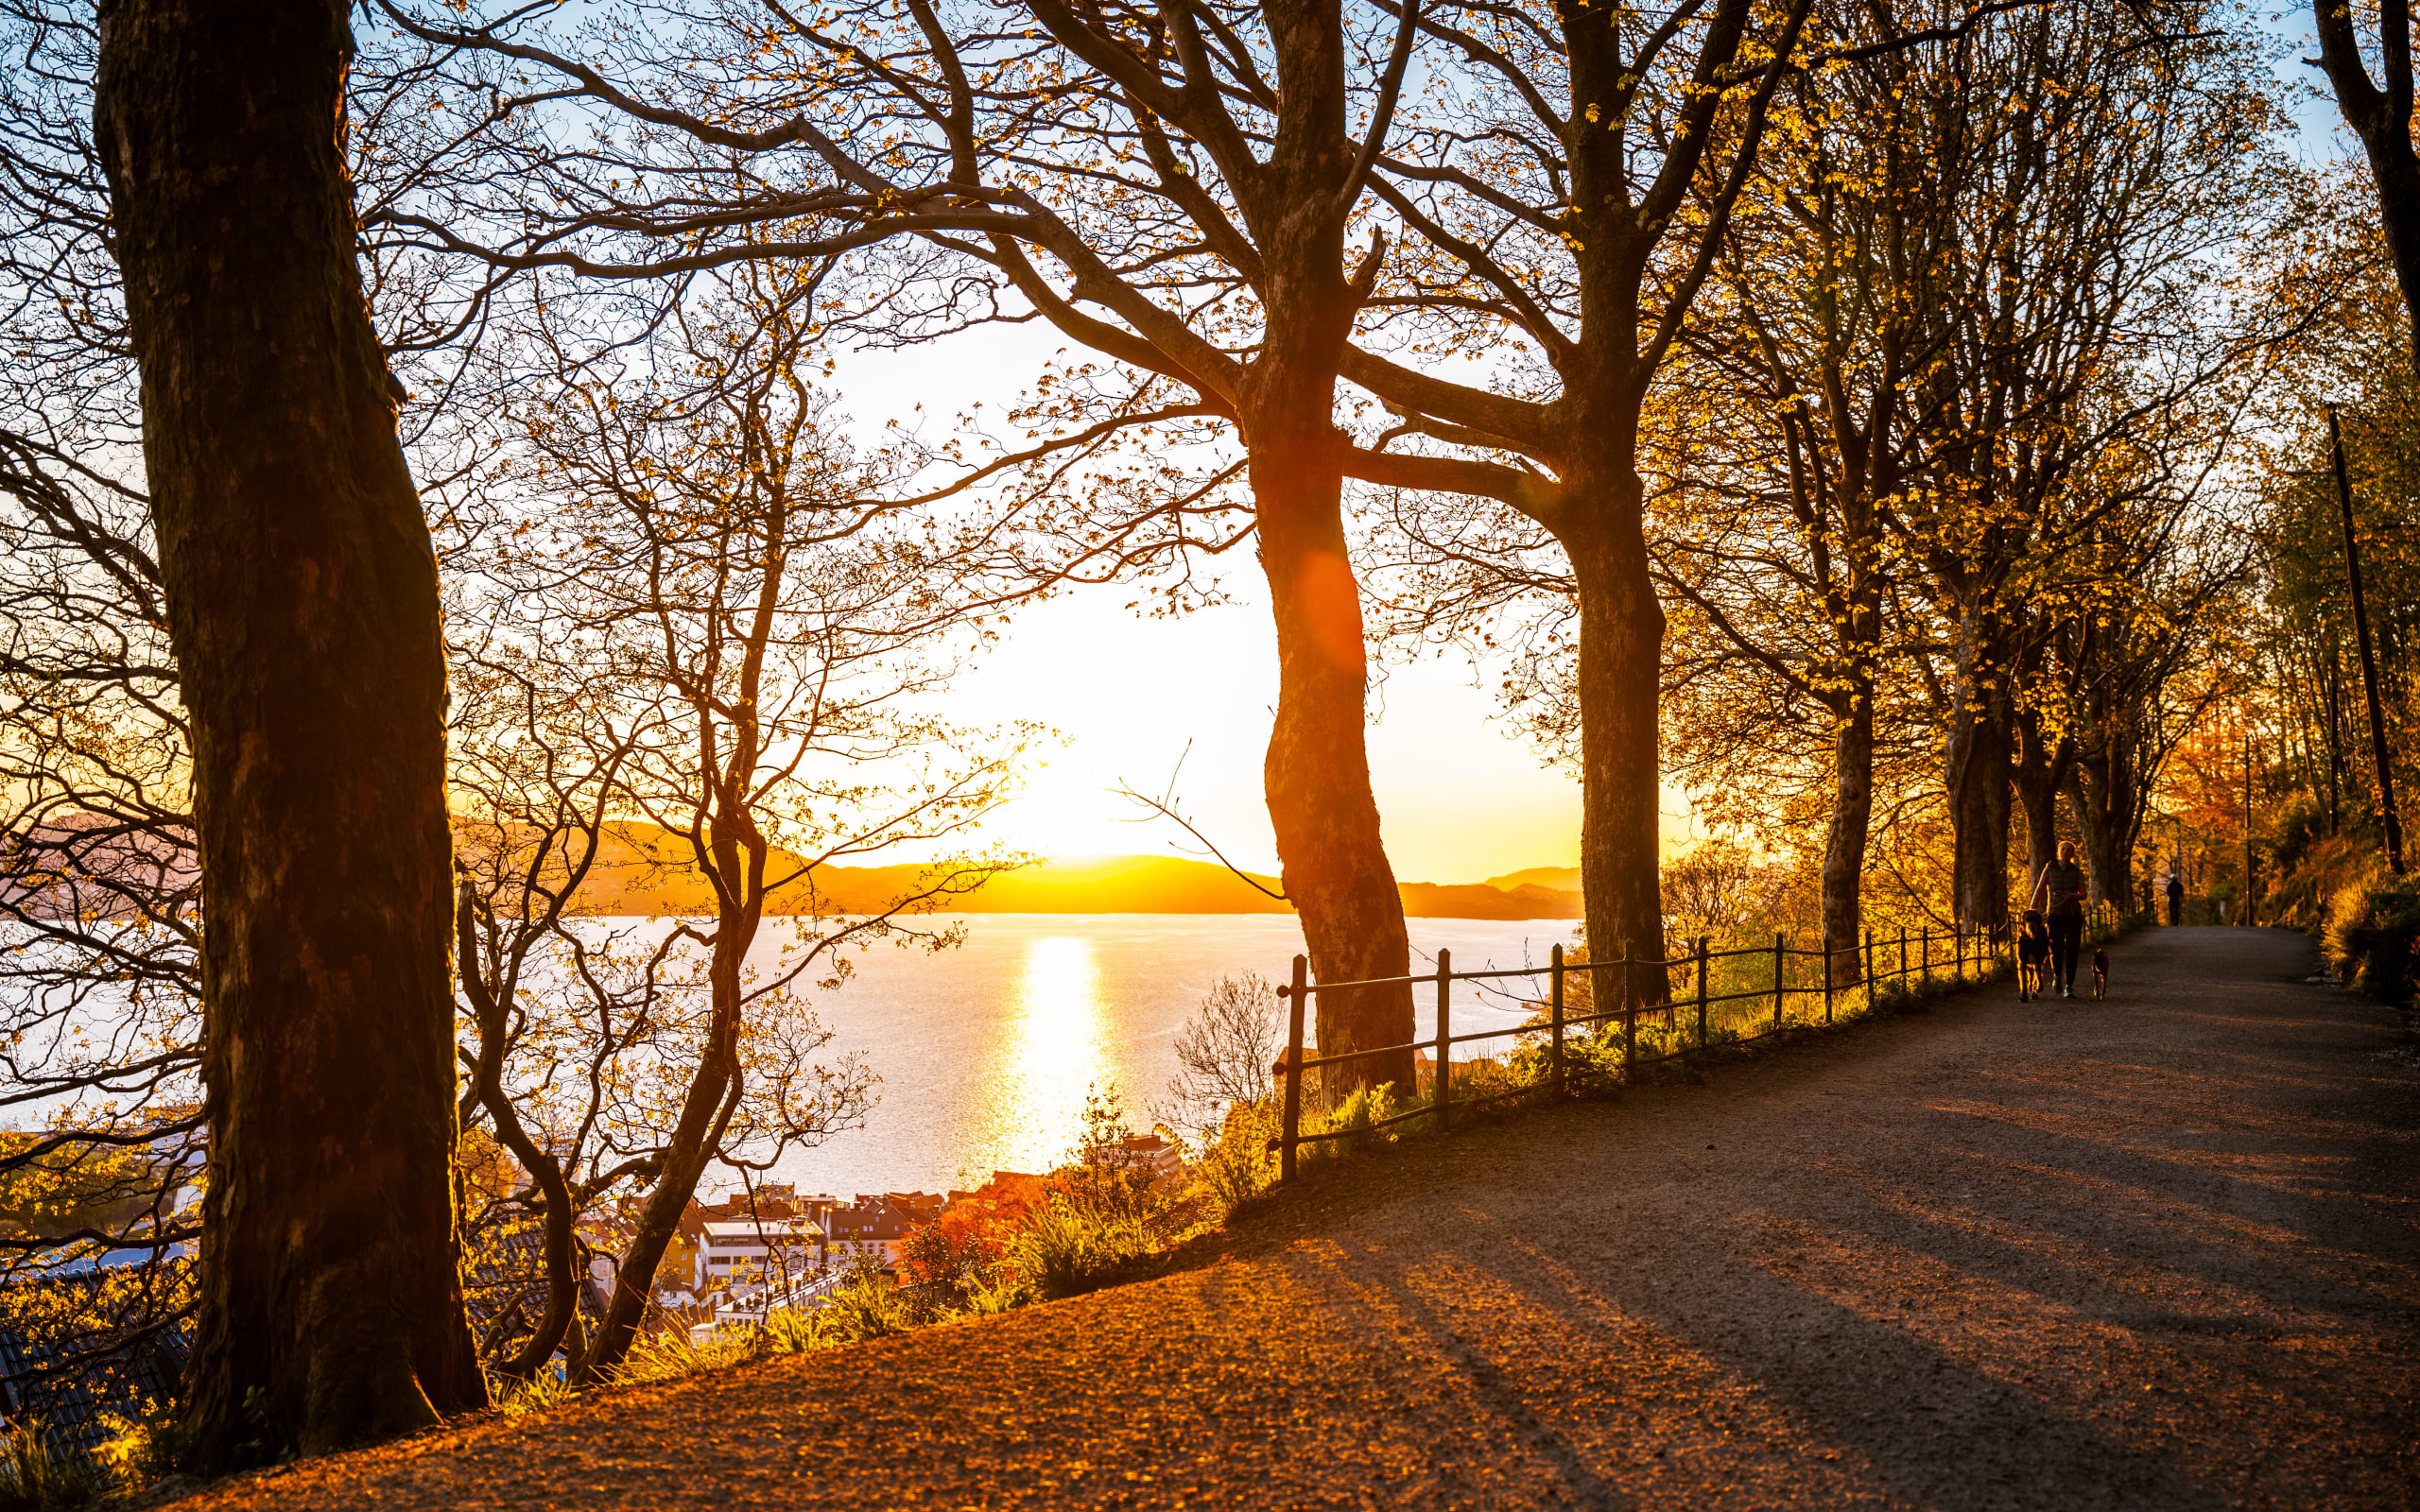 Sunset at Fjellveien walking road